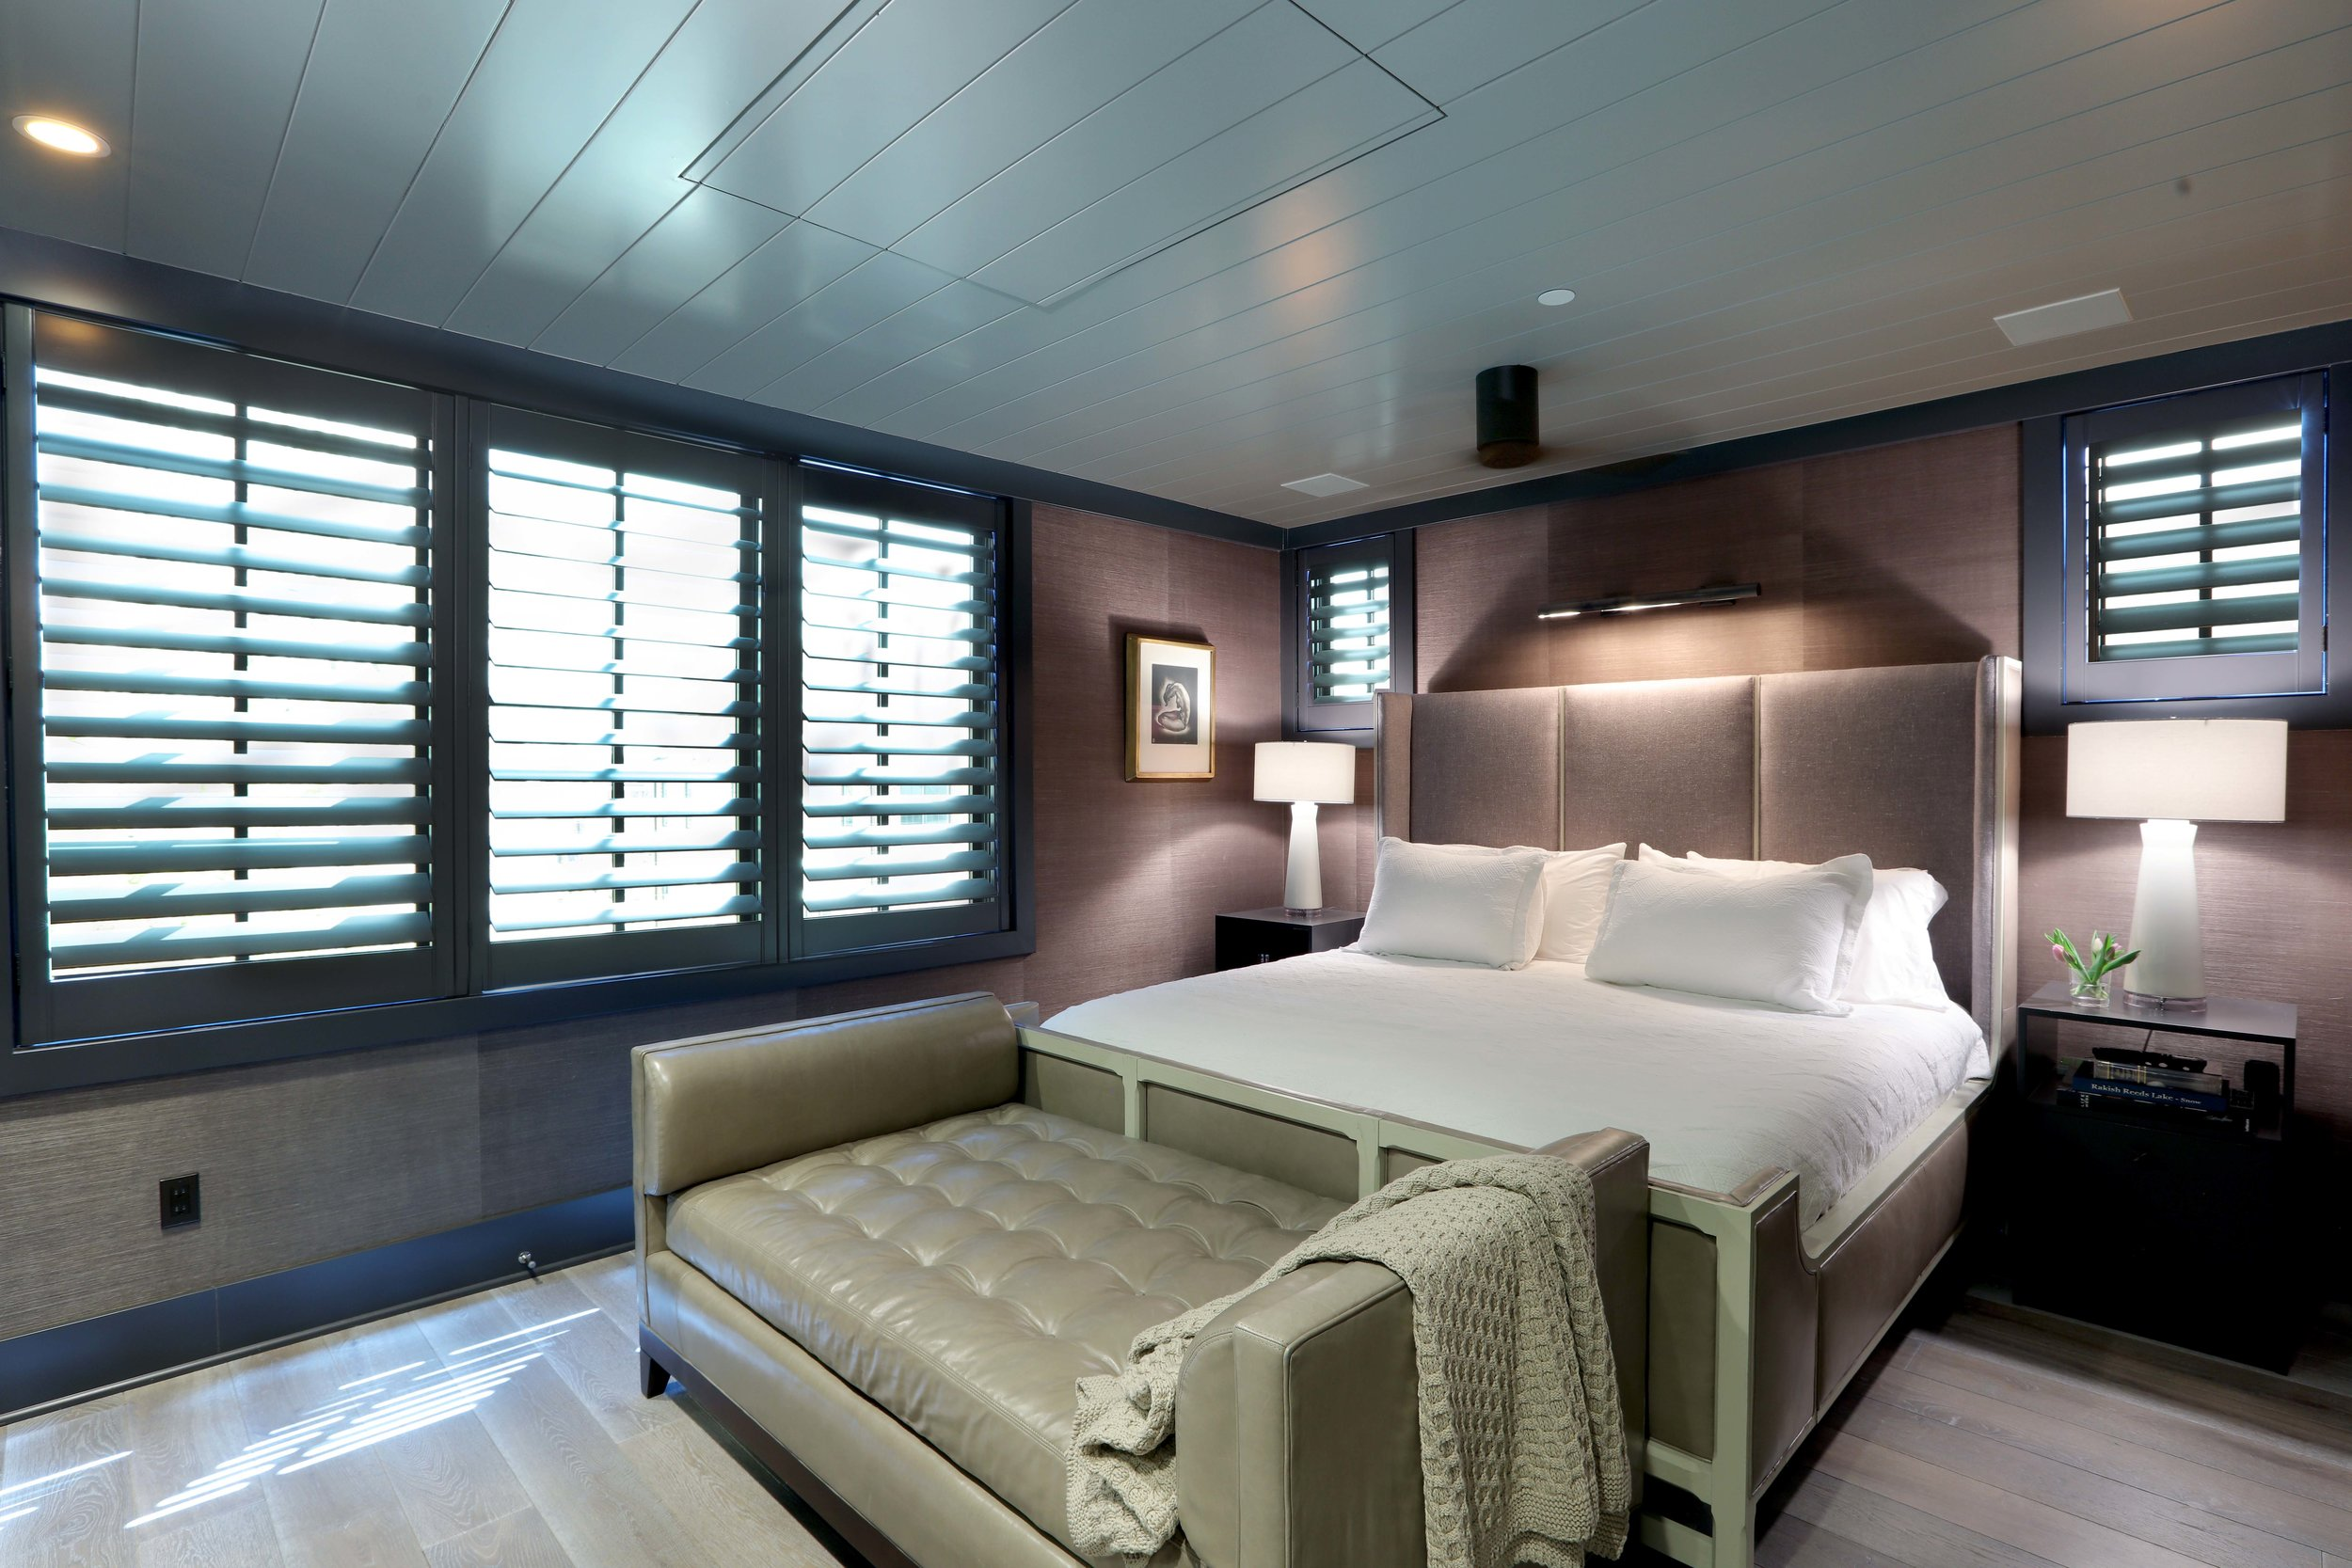 Vision-Interiors-Visbeen-Showroom-Grand-Rapids-Residence-Master-Bedroom.jpg